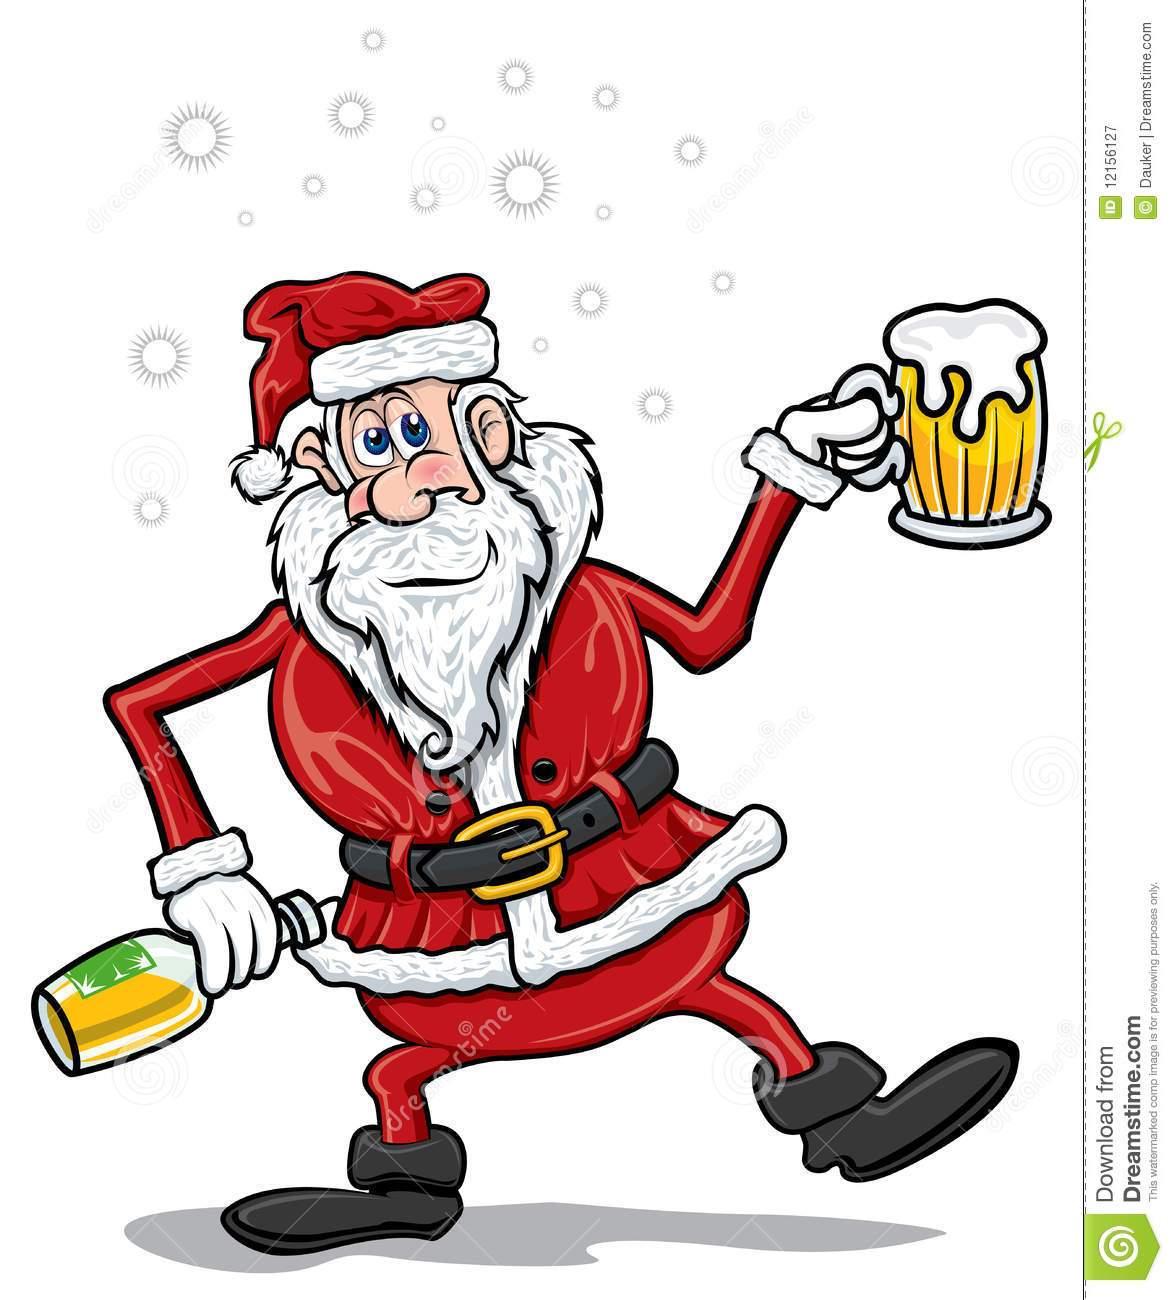 Free drunk santa clipart png transparent library Free drunk santa clipart 8 » Clipart Portal png transparent library